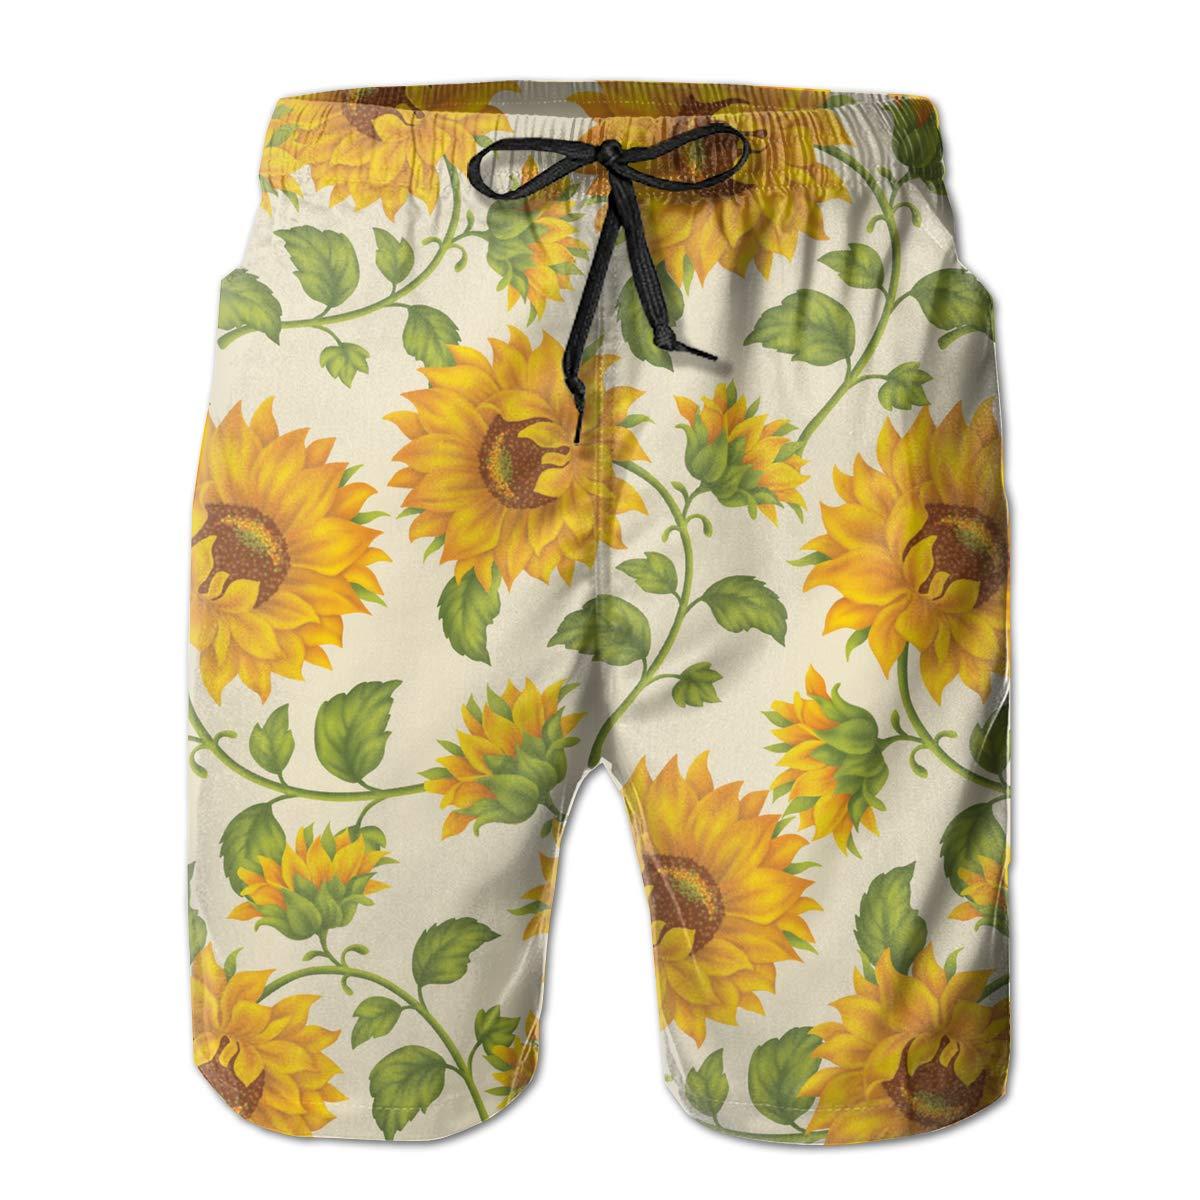 YongColer Breathable Boys Big /& Tall Swim Trunks Half Pants for Beach Outdoor Hiking